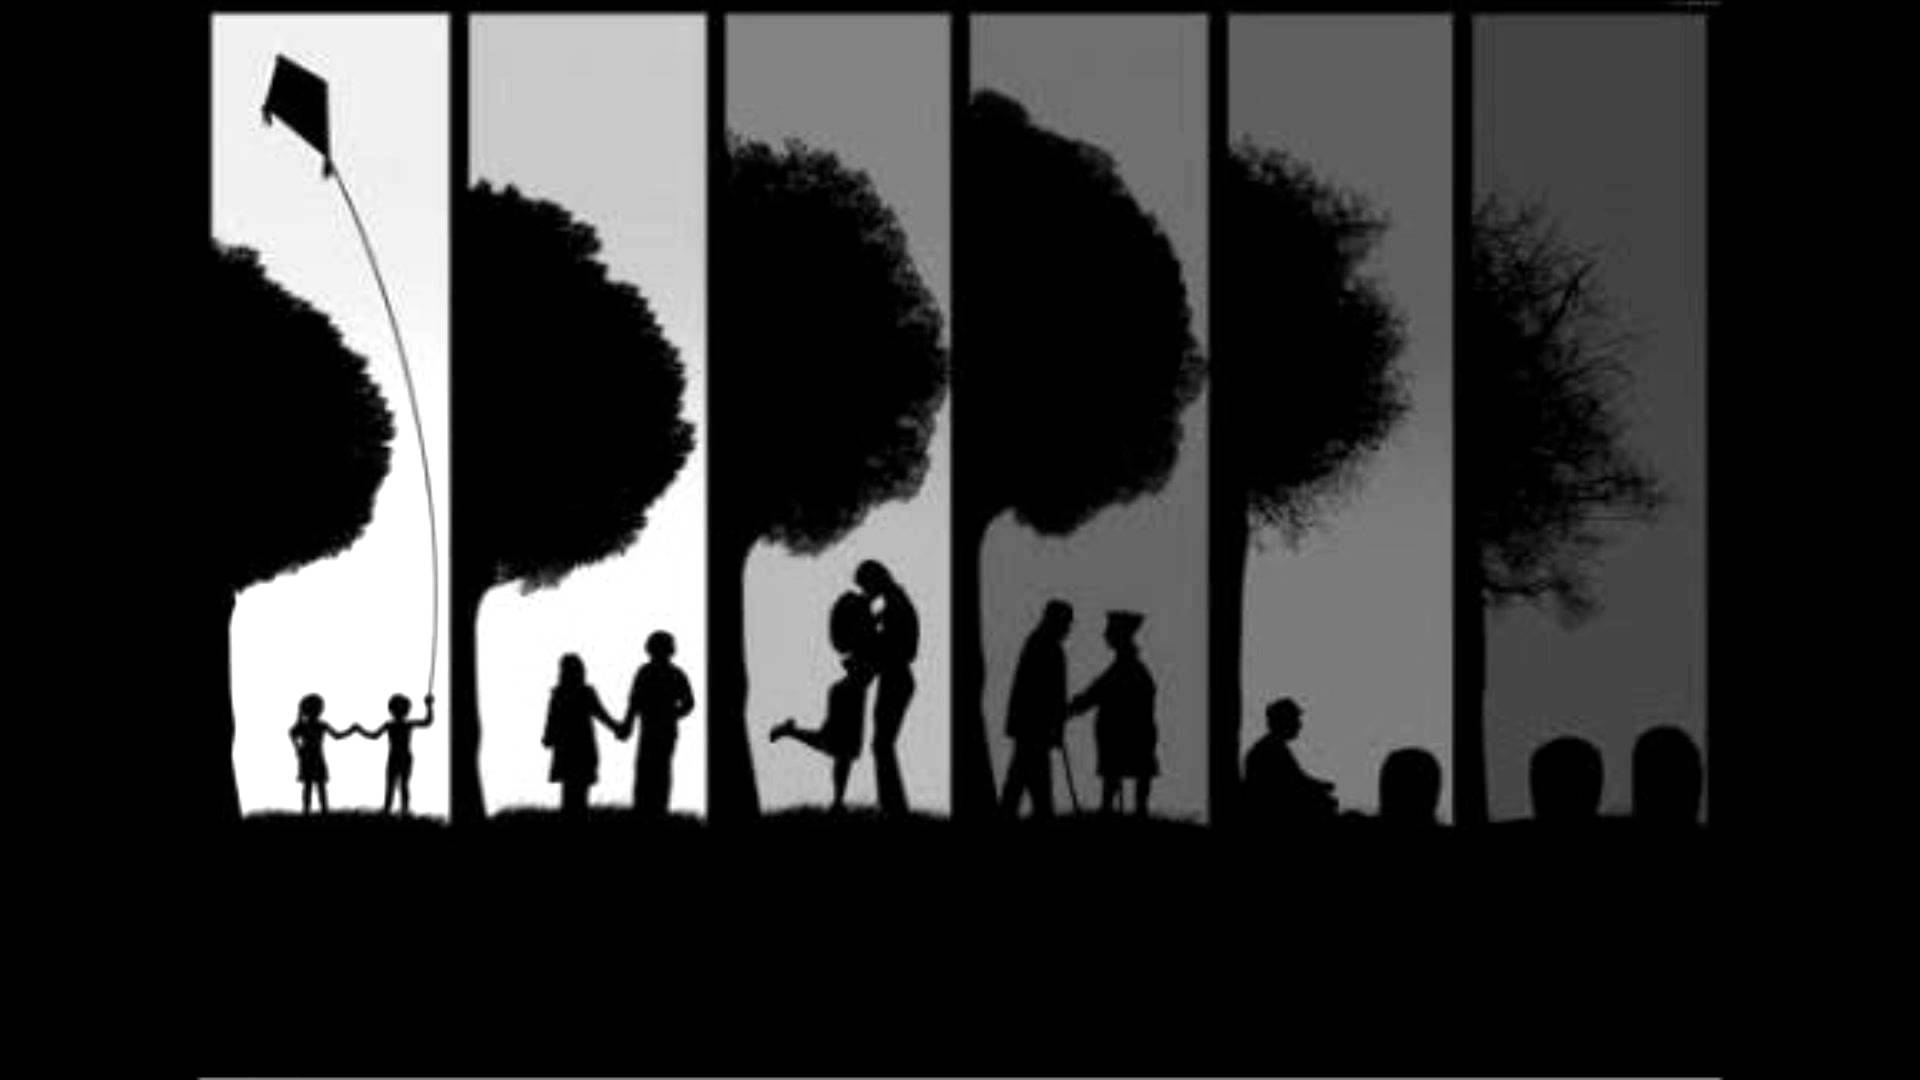 Idades da Vida